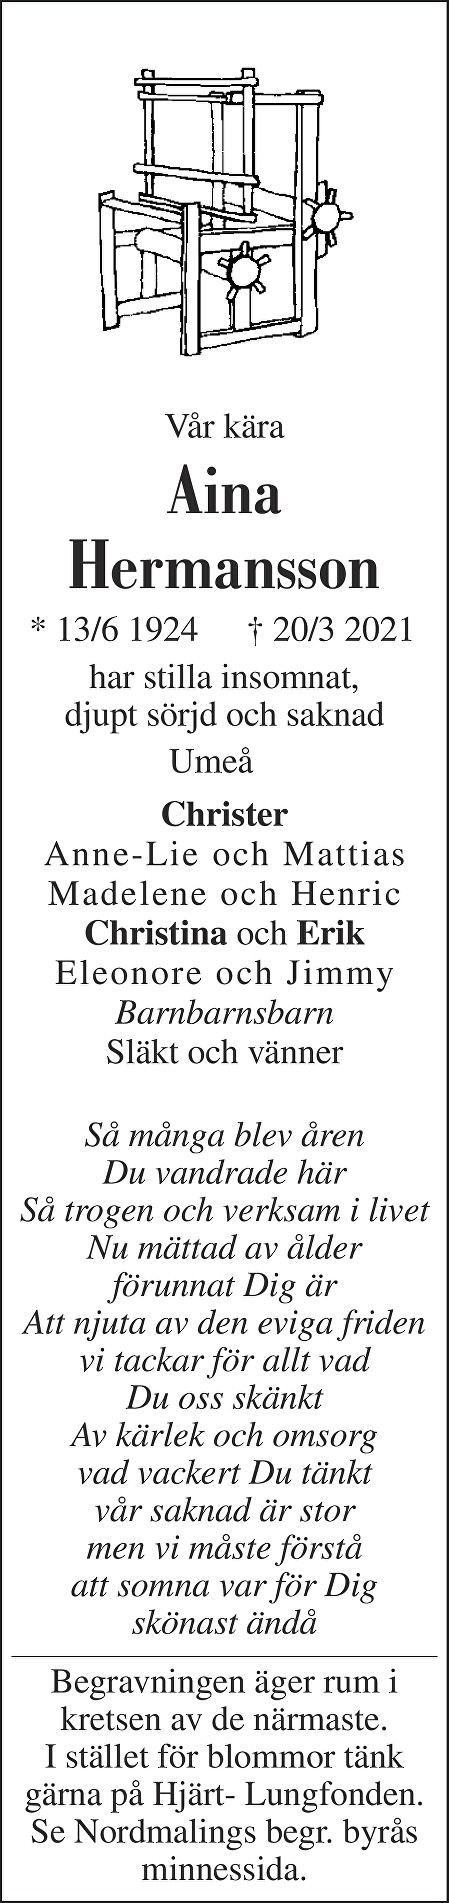 Aina Hermansson Death notice